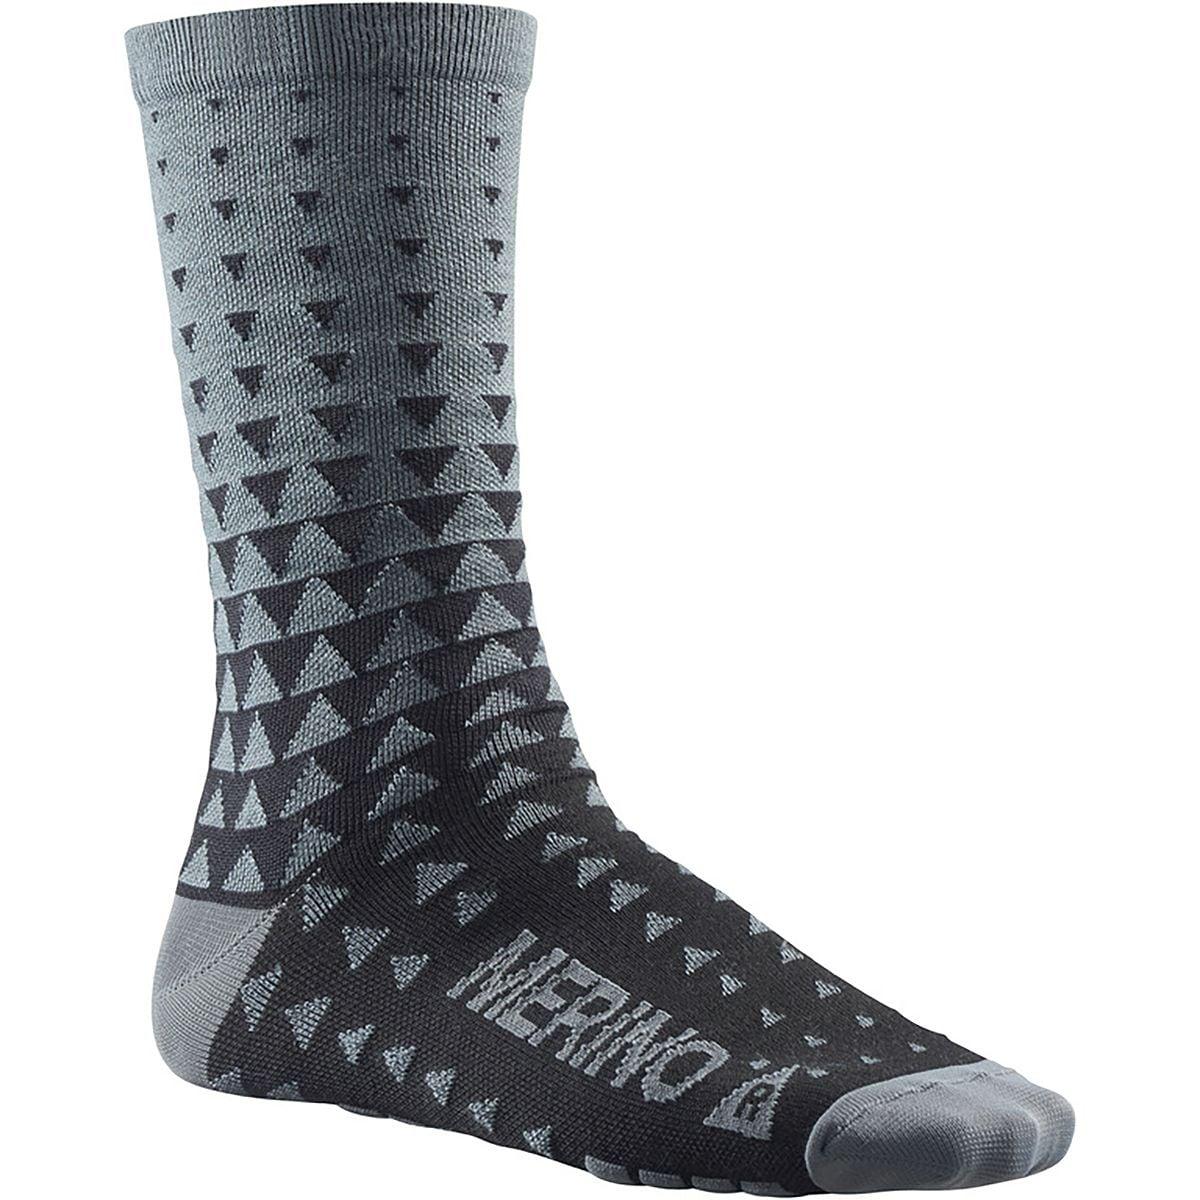 Mavic Ksyrium Merino Graphic Sock - Men's